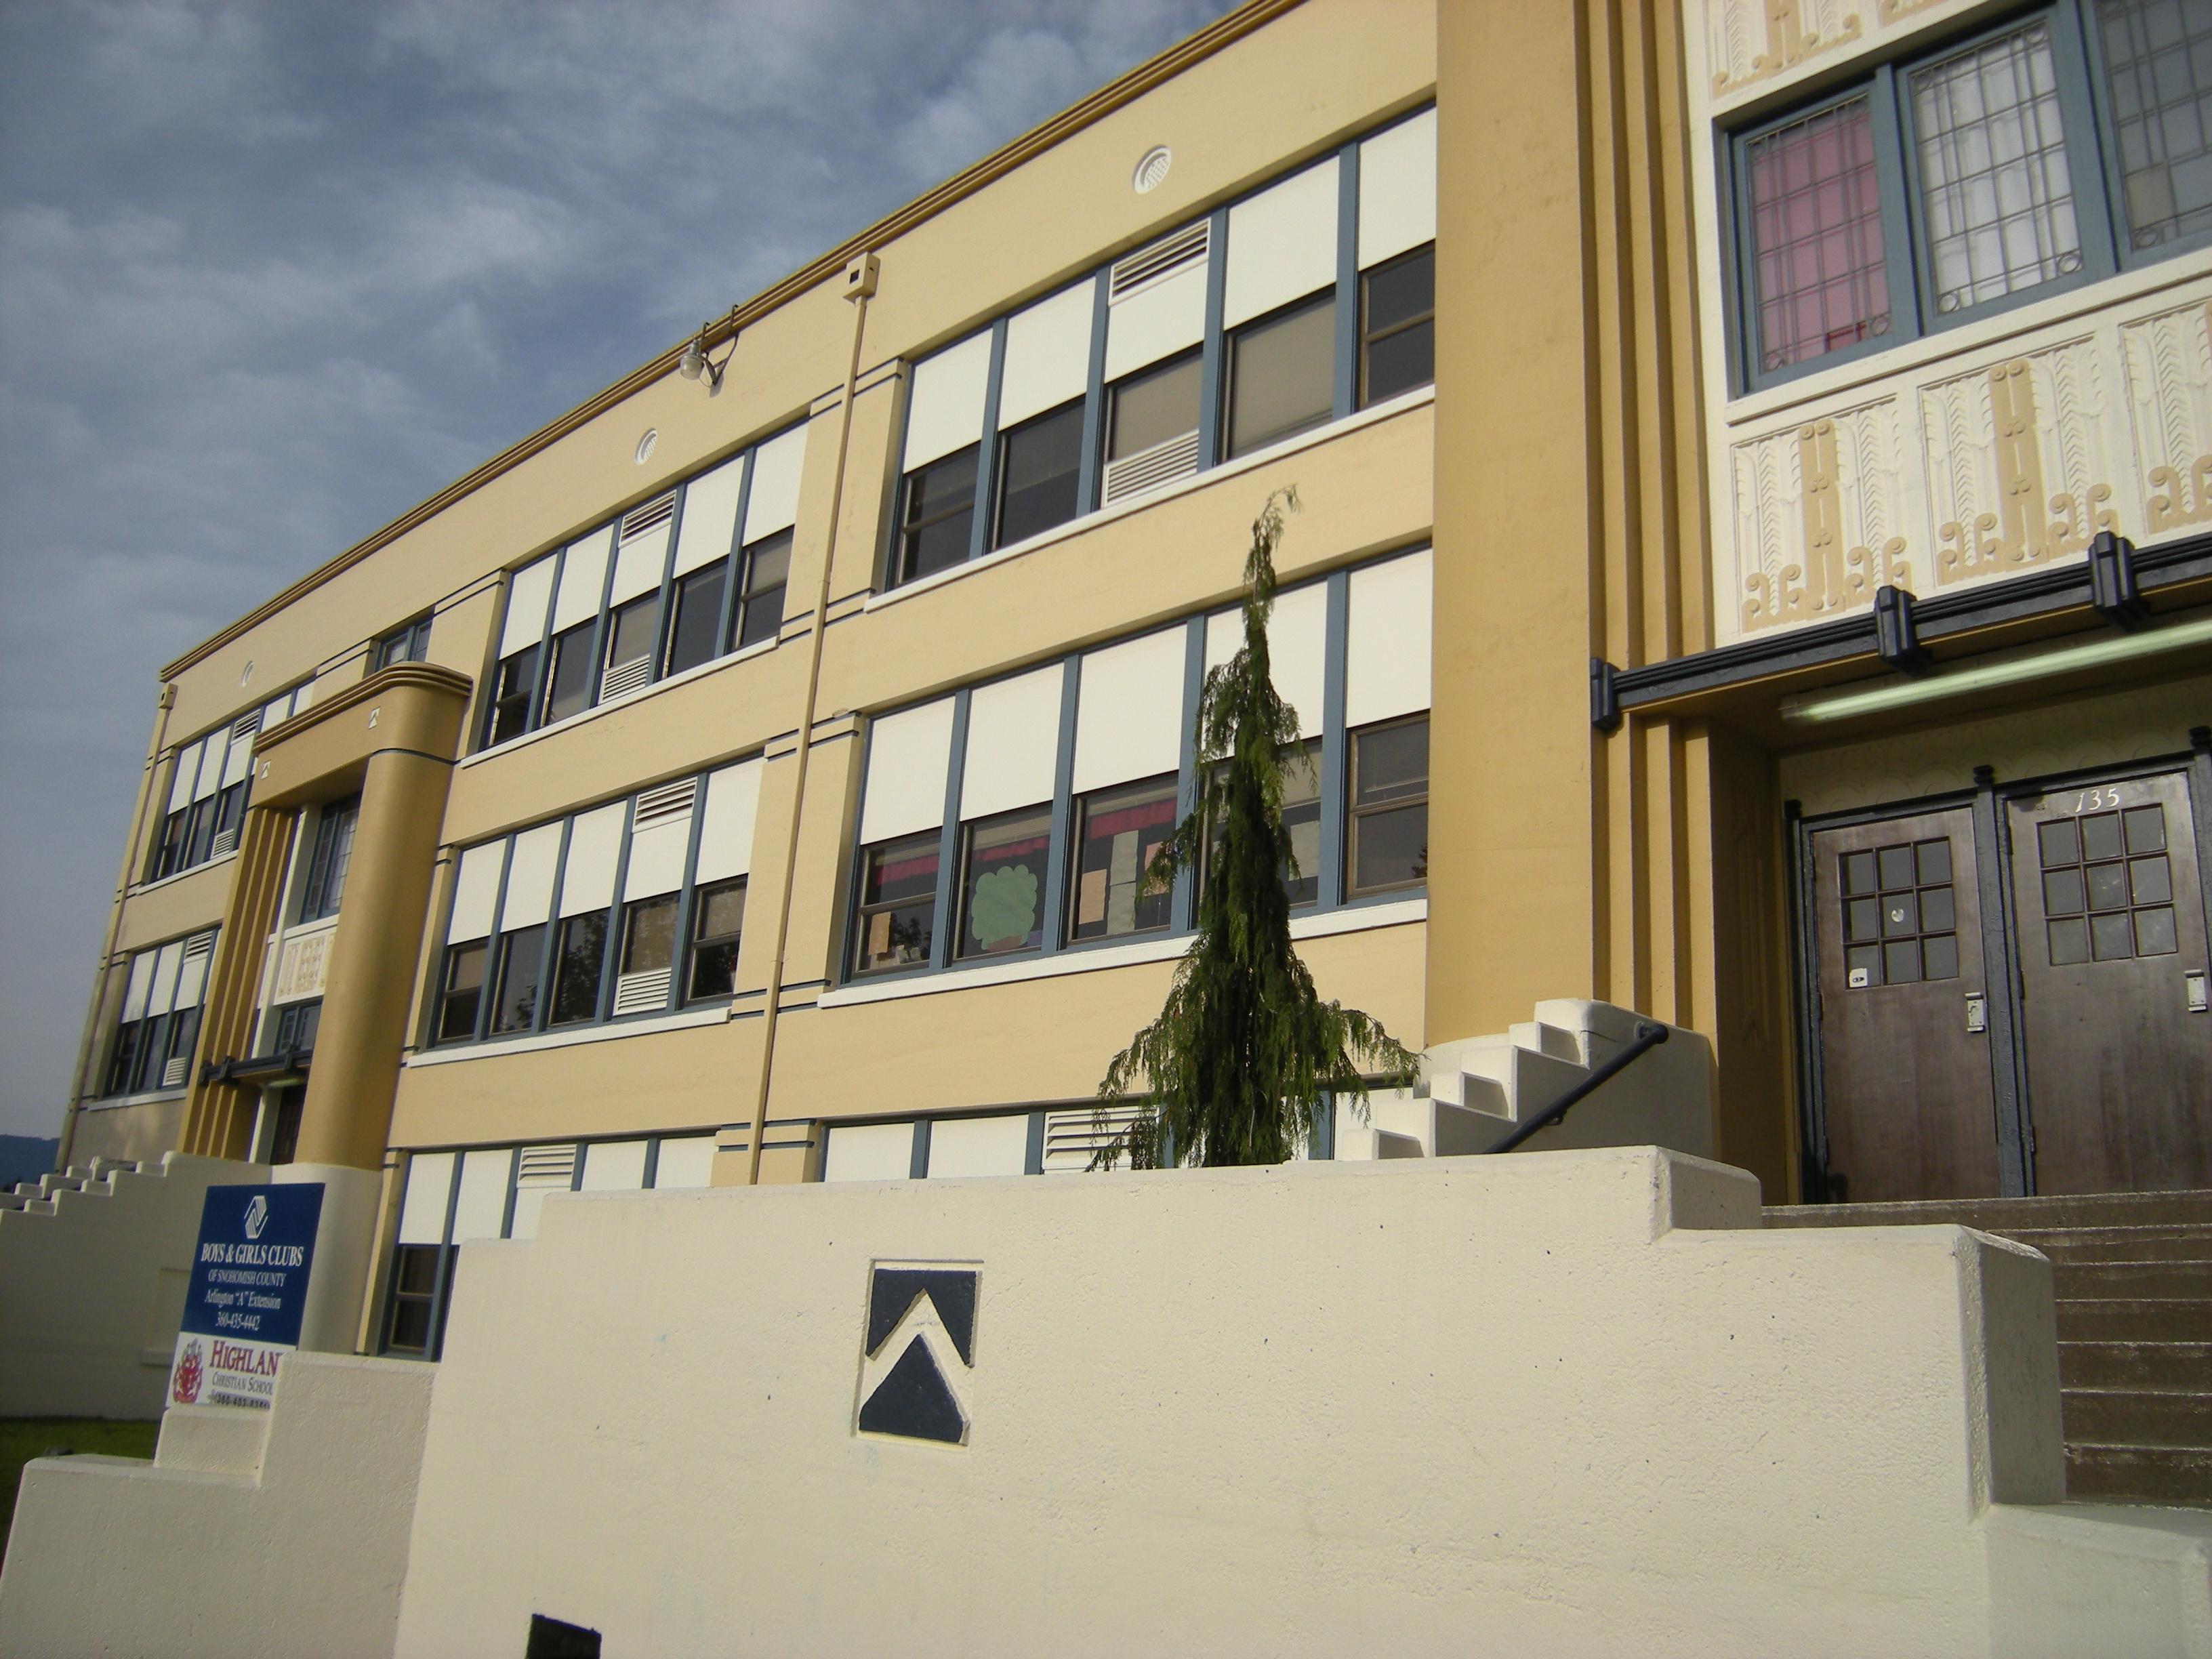 File:Arlington, WA - old Arlington High School 04.jpg - Wikimedia ...